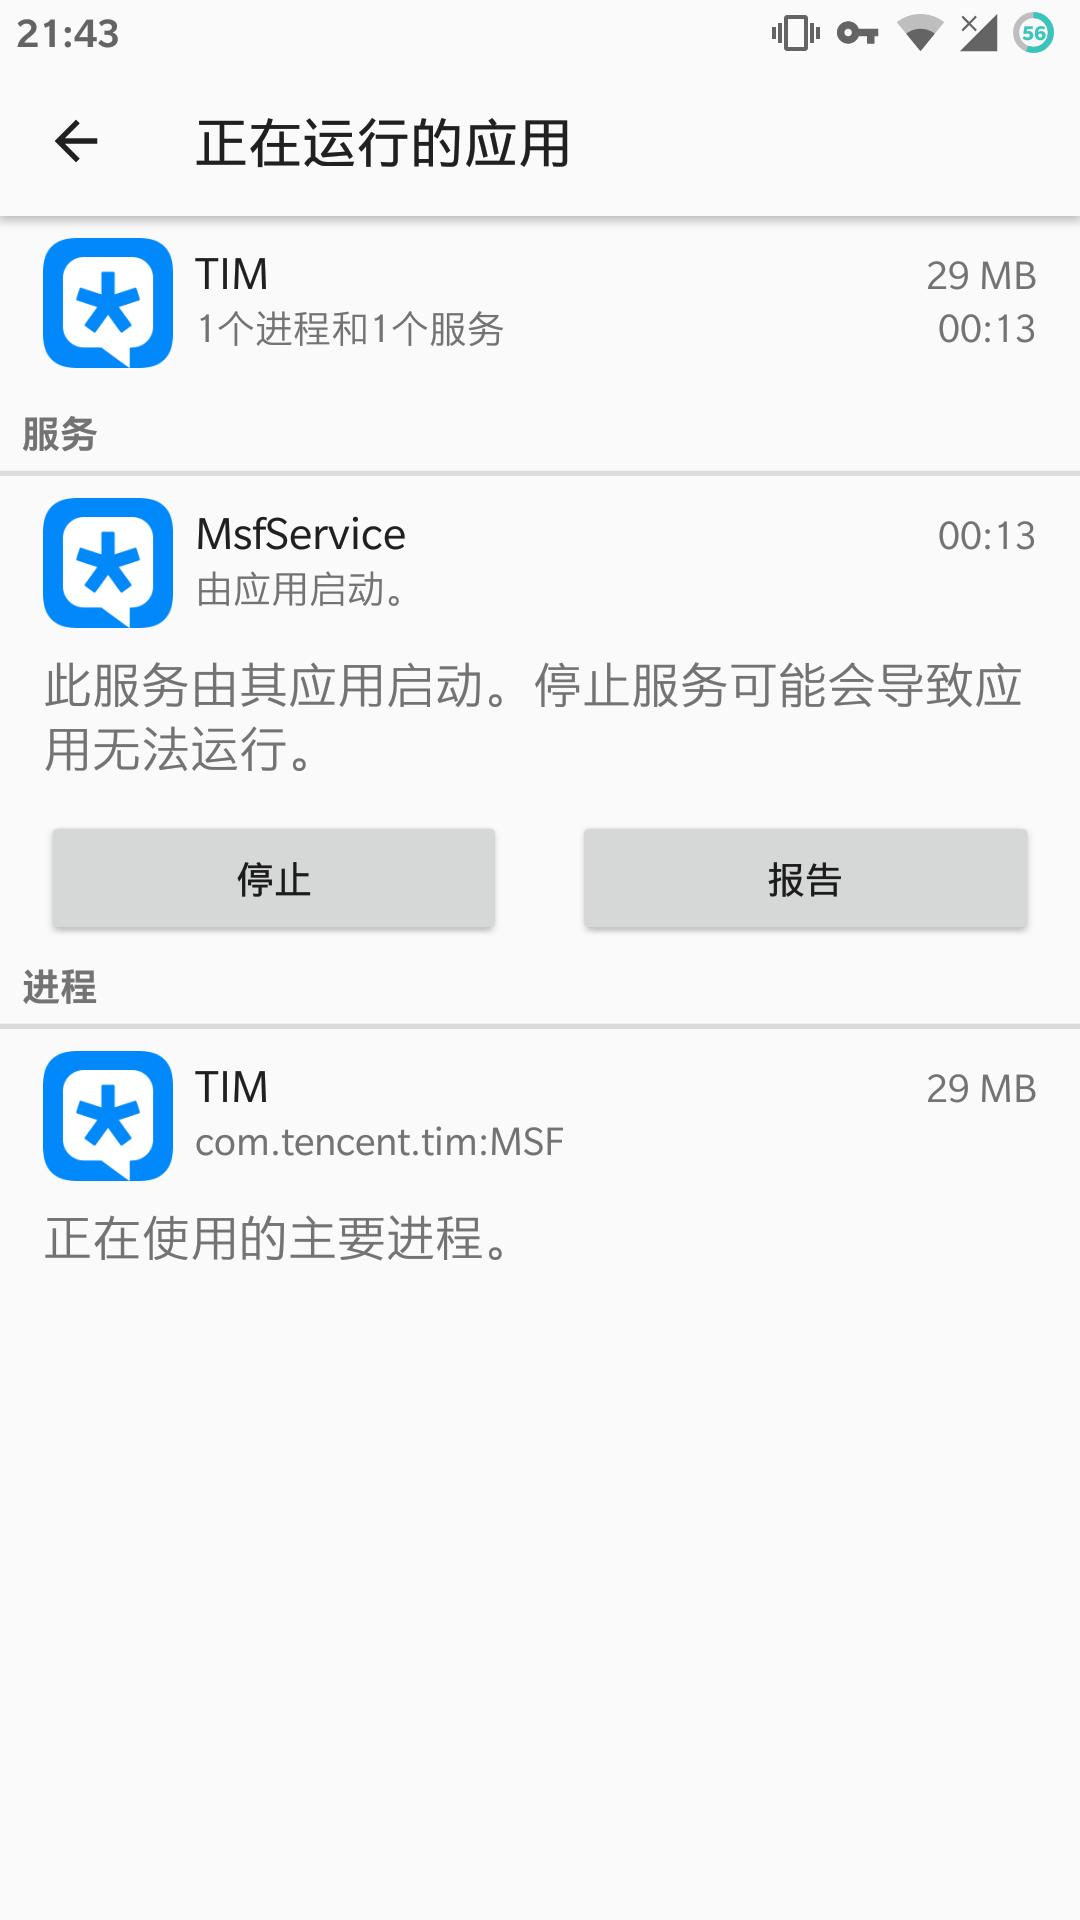 Screenshot_20170914-214321.png